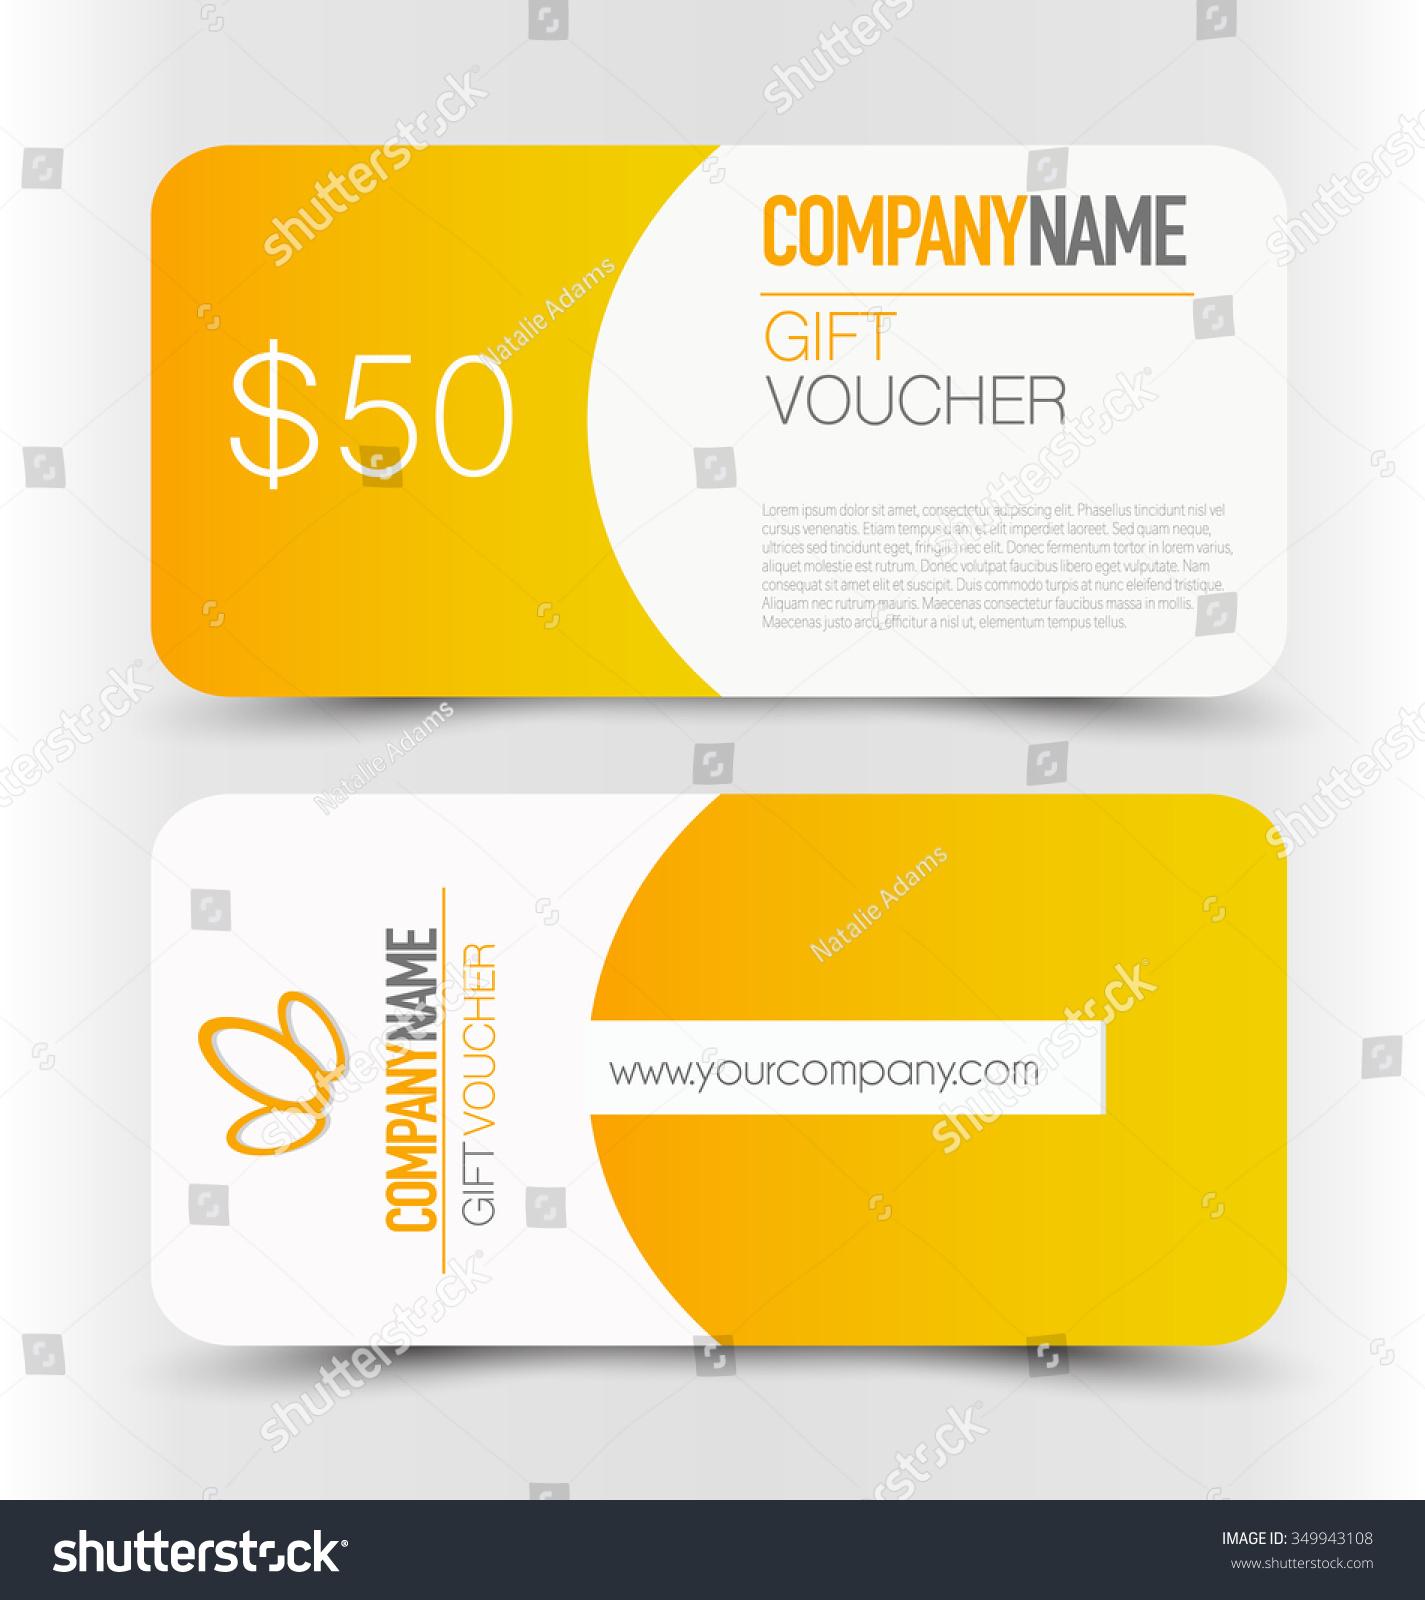 Gift Card Voucher Business Banner Template Stock Vector